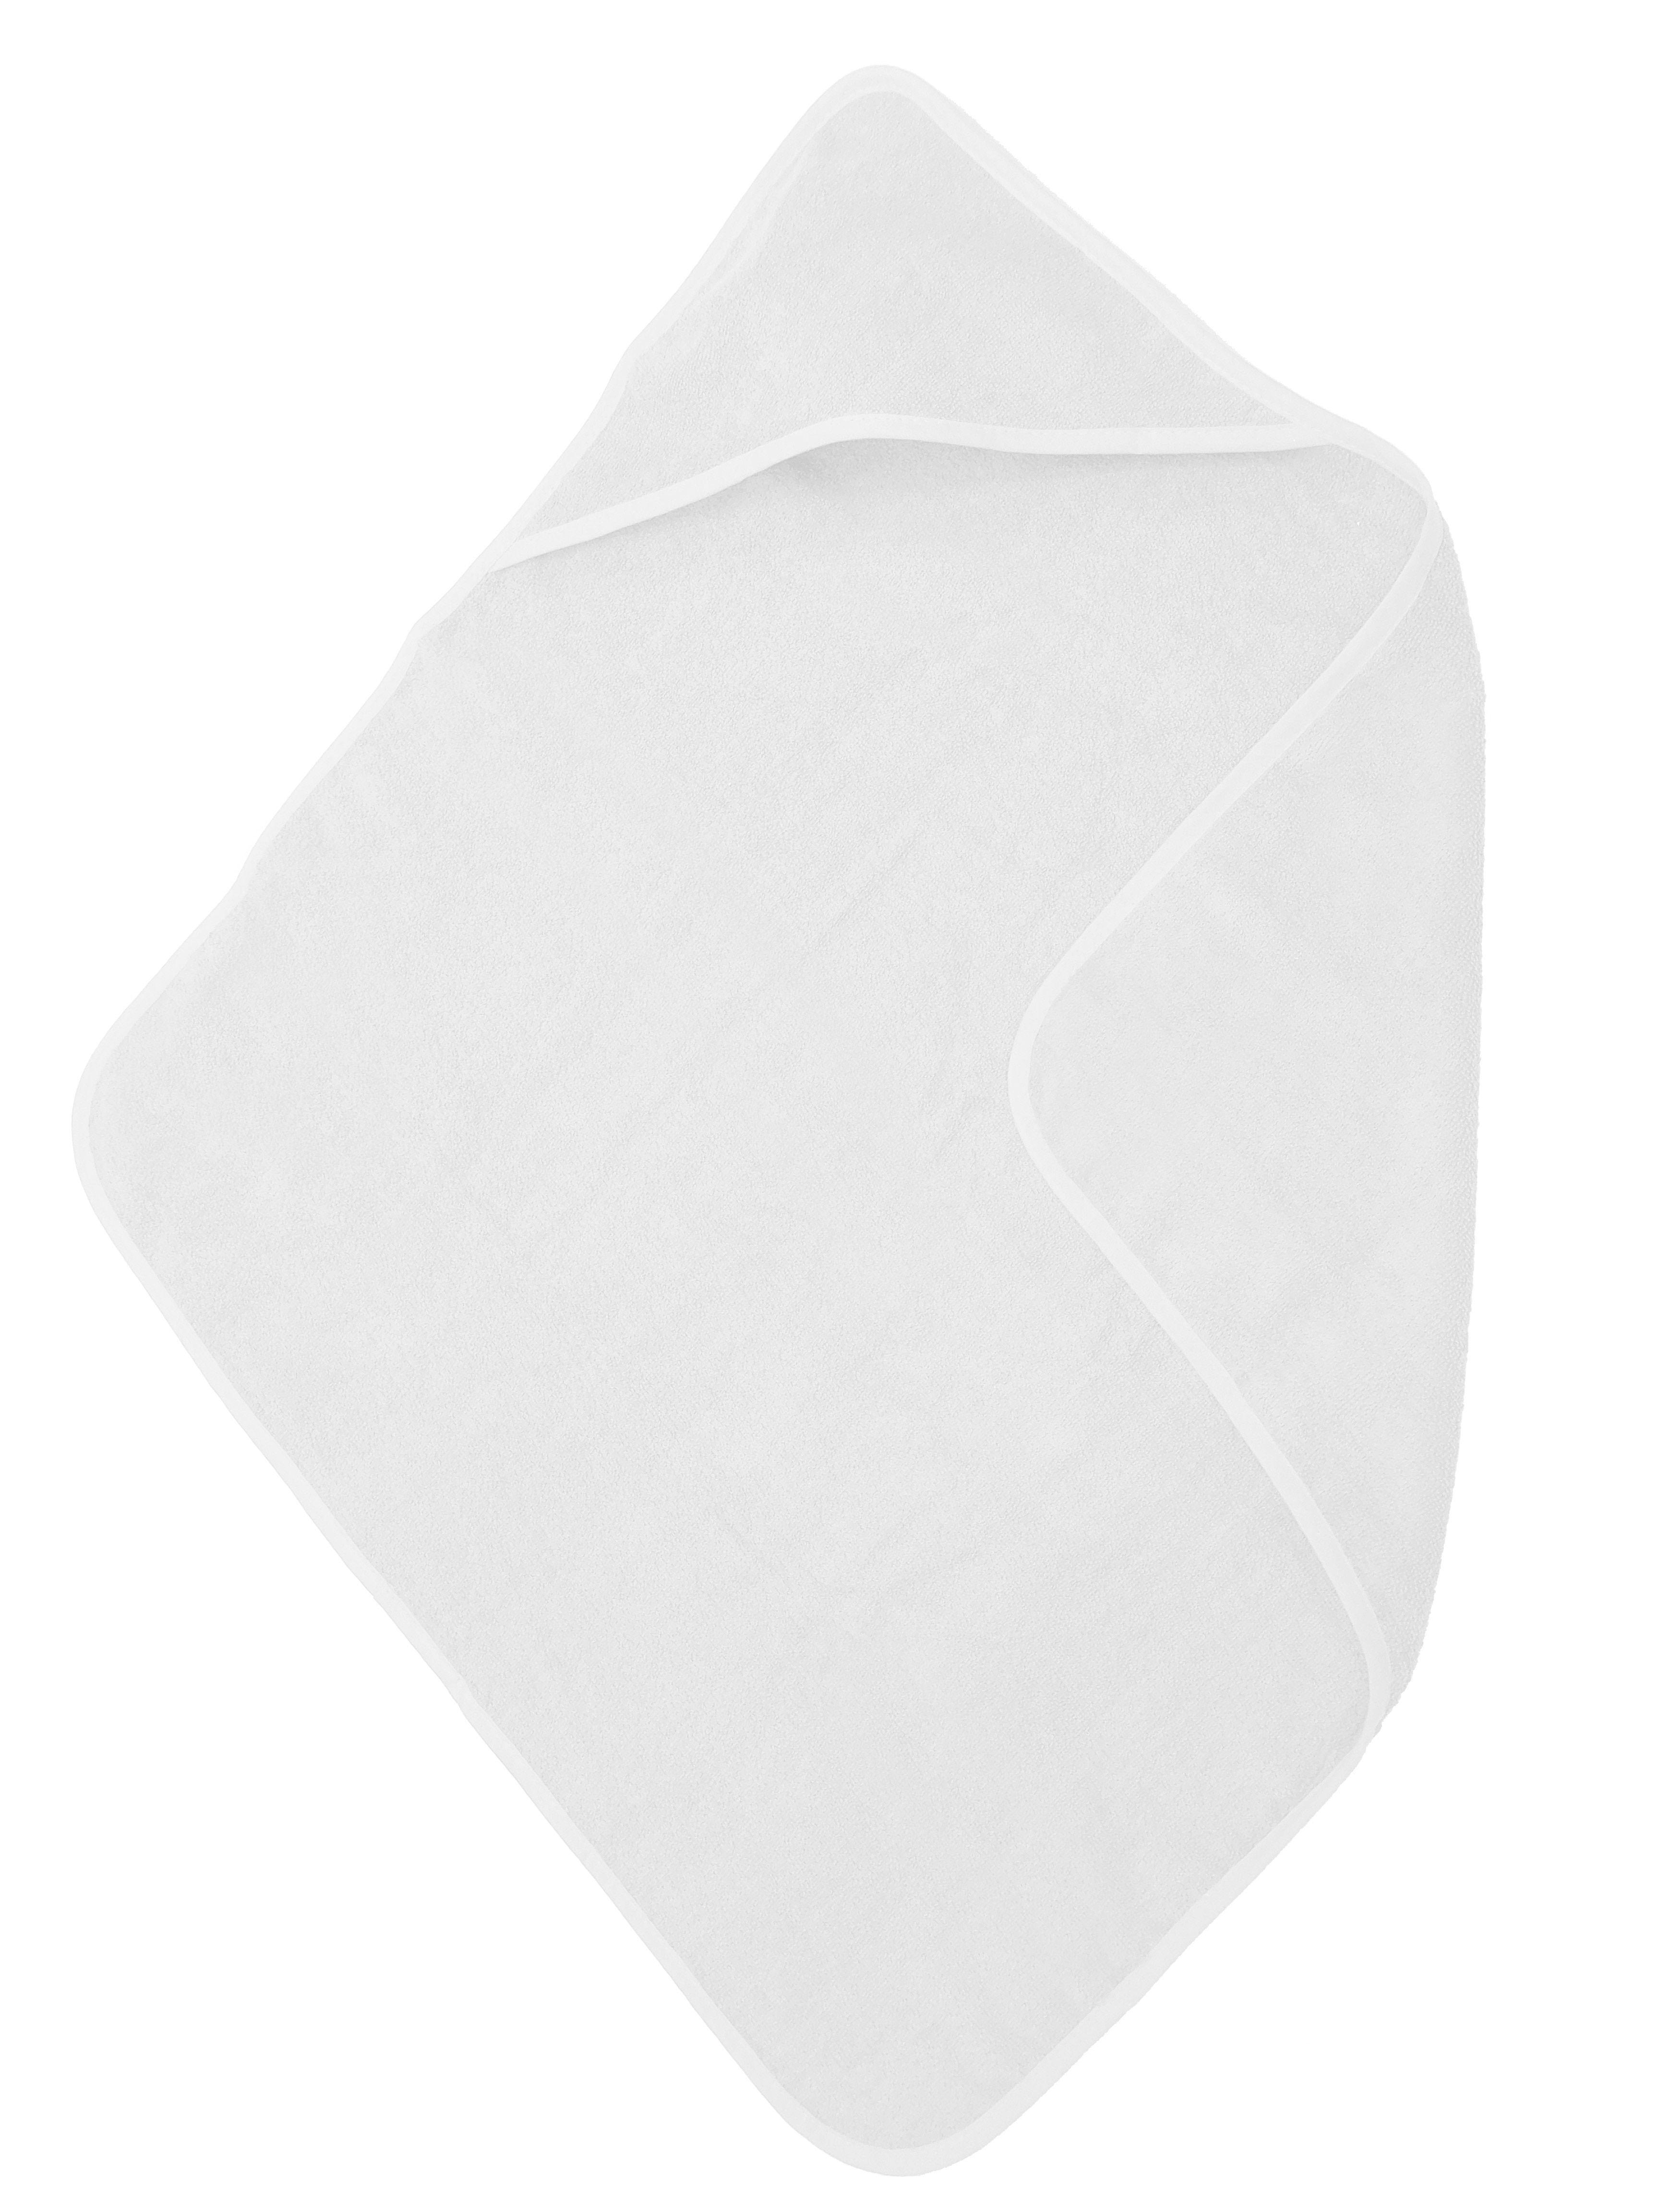 The One Baby Handdoek 75x75 White